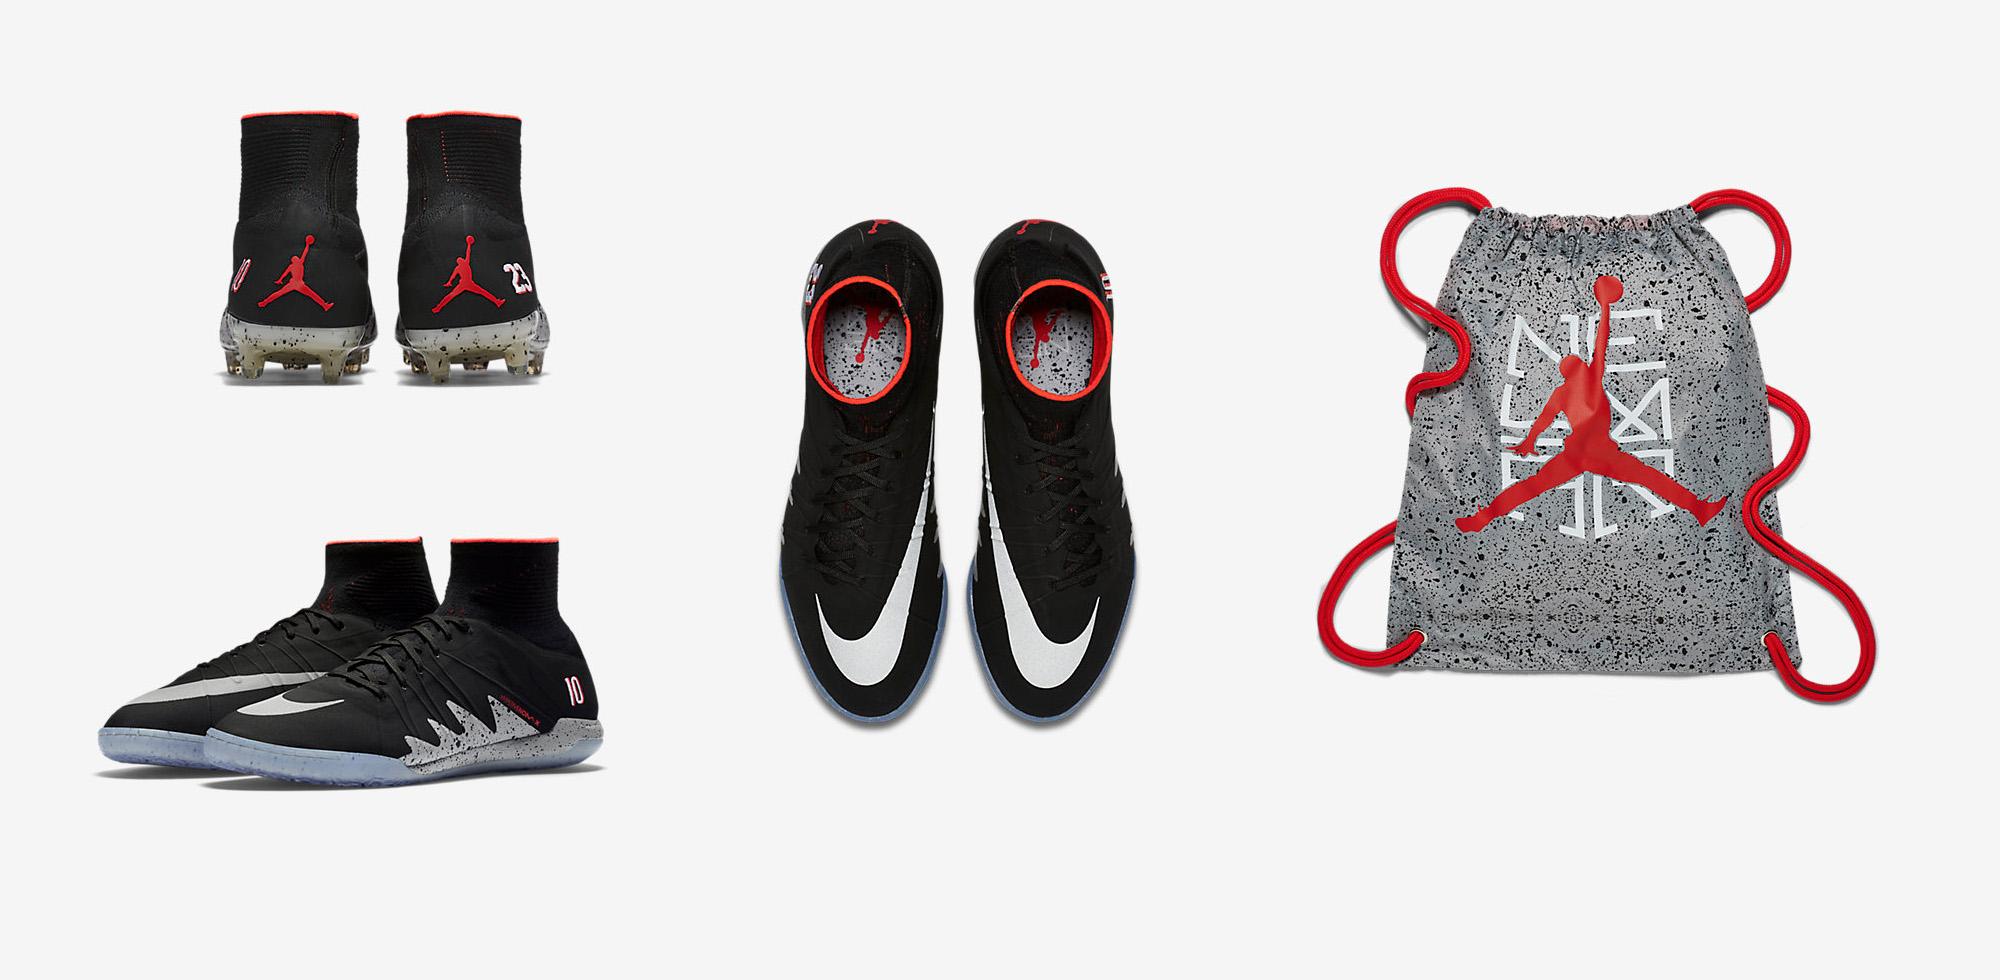 c0c70b485c8 Nike HypervenomX Proximo IC NJR x Jordan: 820118-006. neymar-jordan